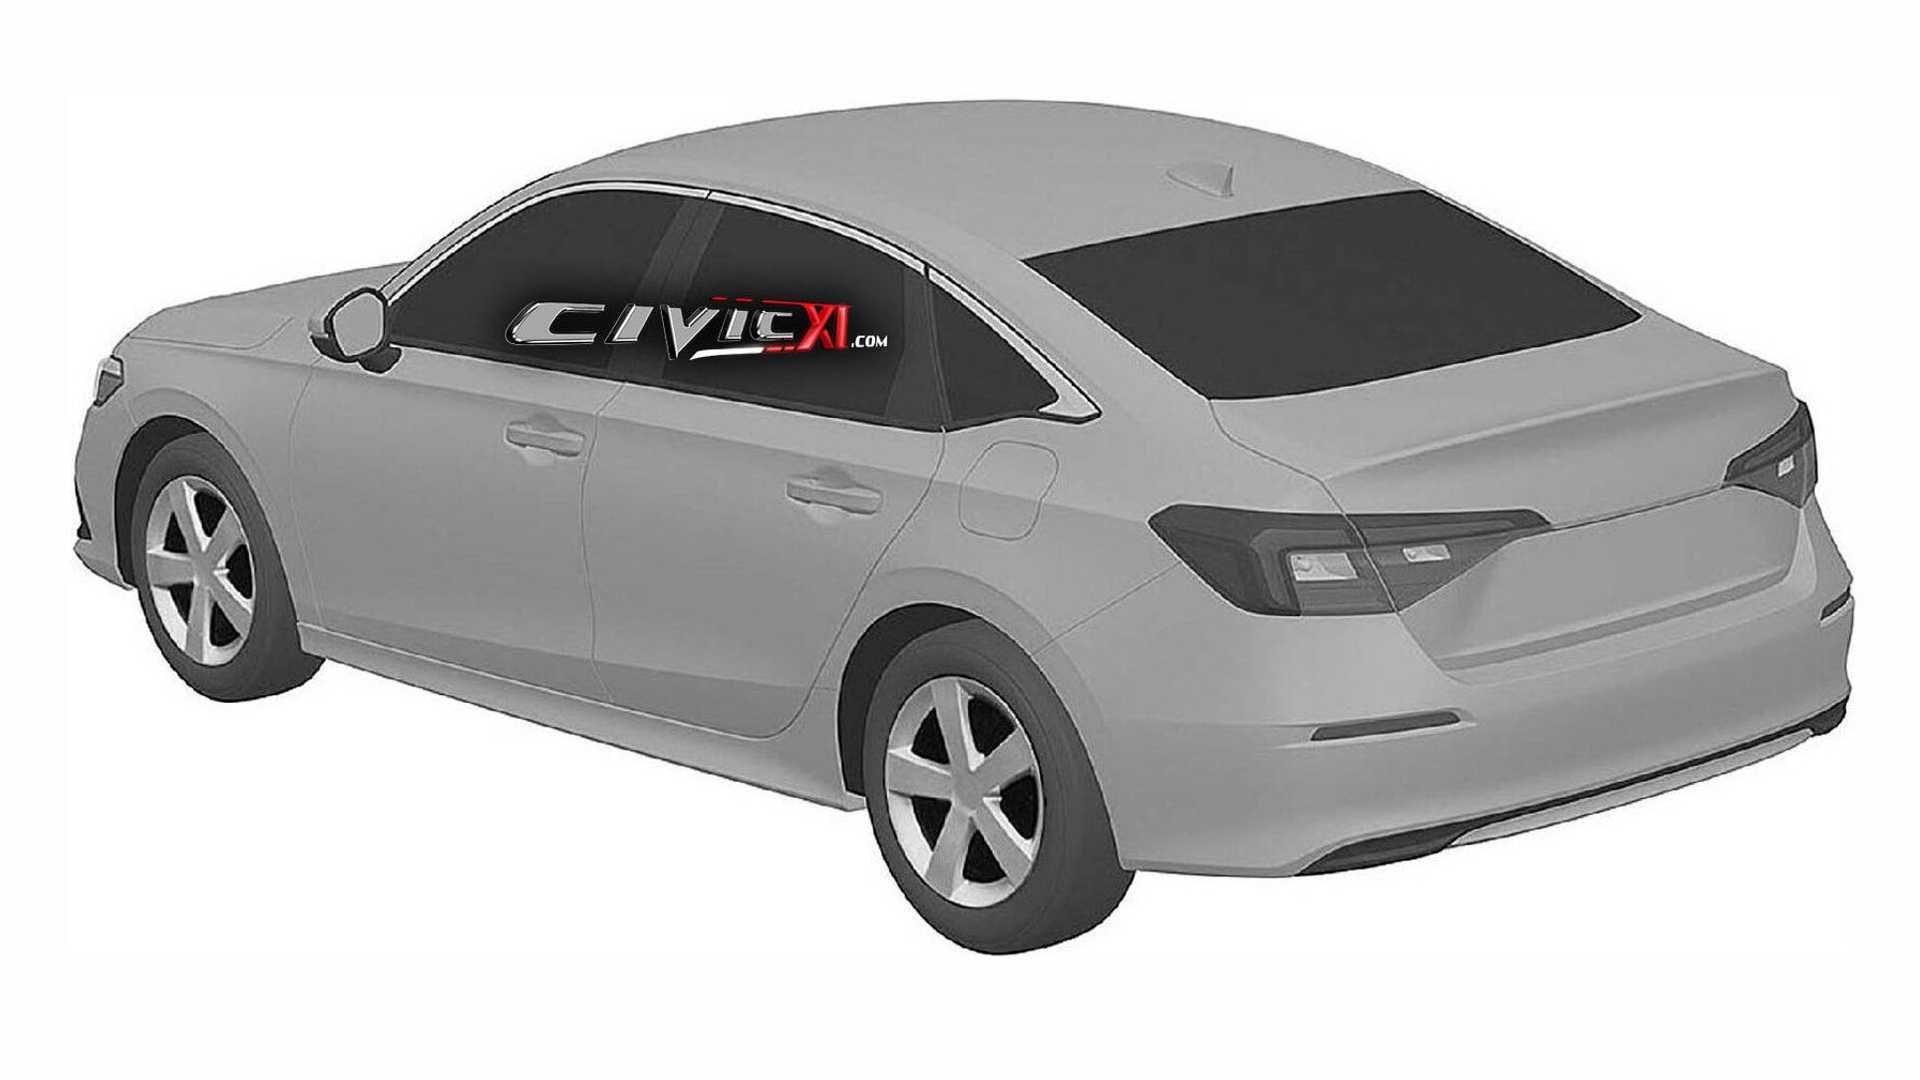 2022 Honda Civic Sedan Gets Early Reveal Via Trademark Office